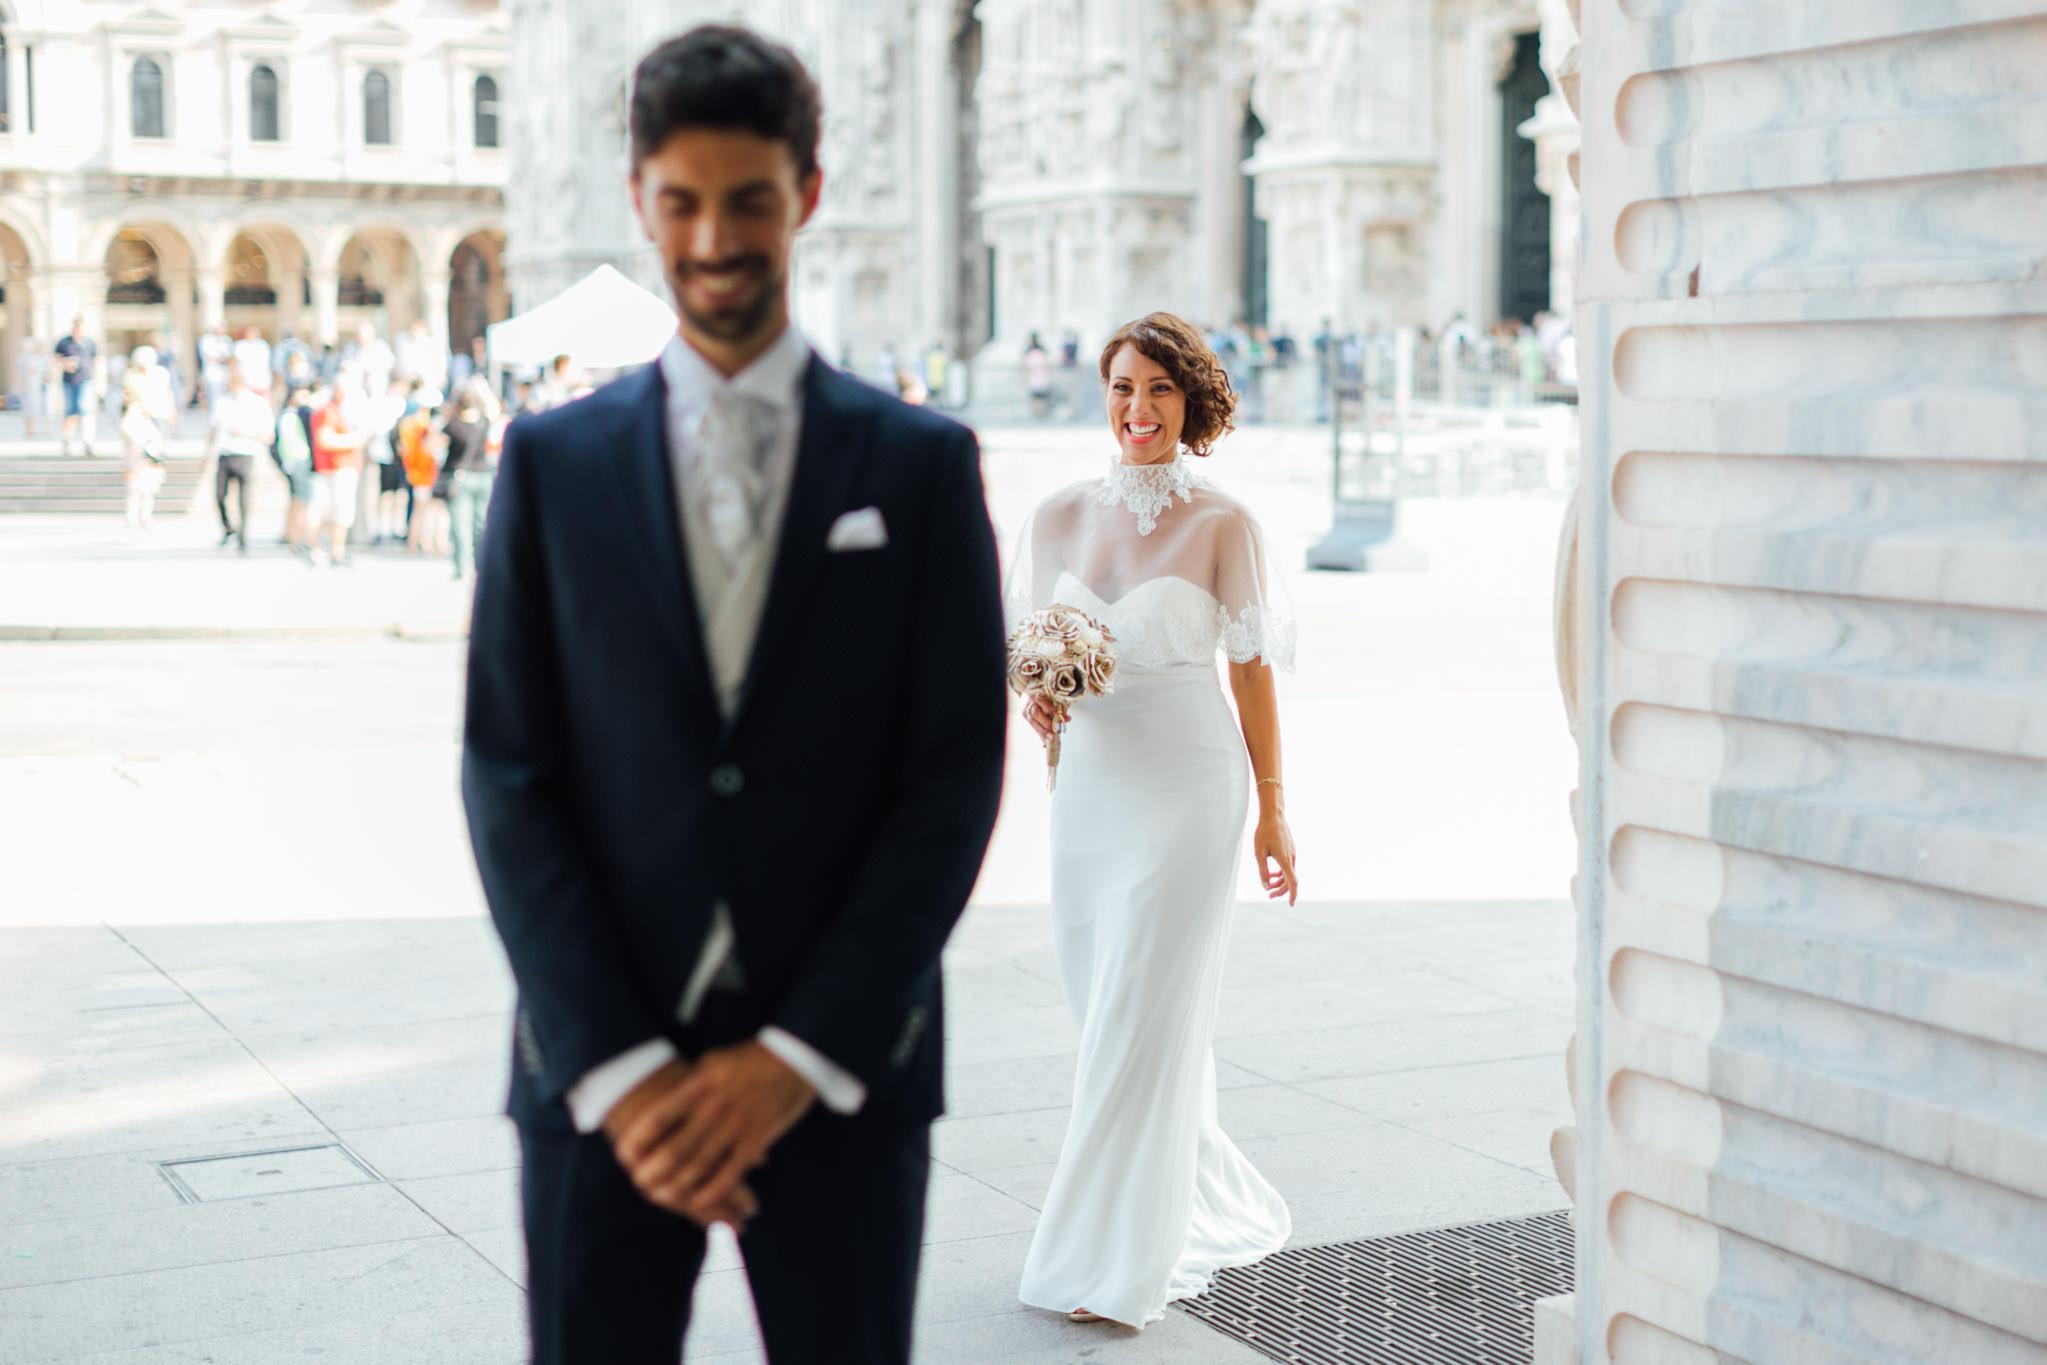 fotografia_di_matrimonio_portfolio-1090